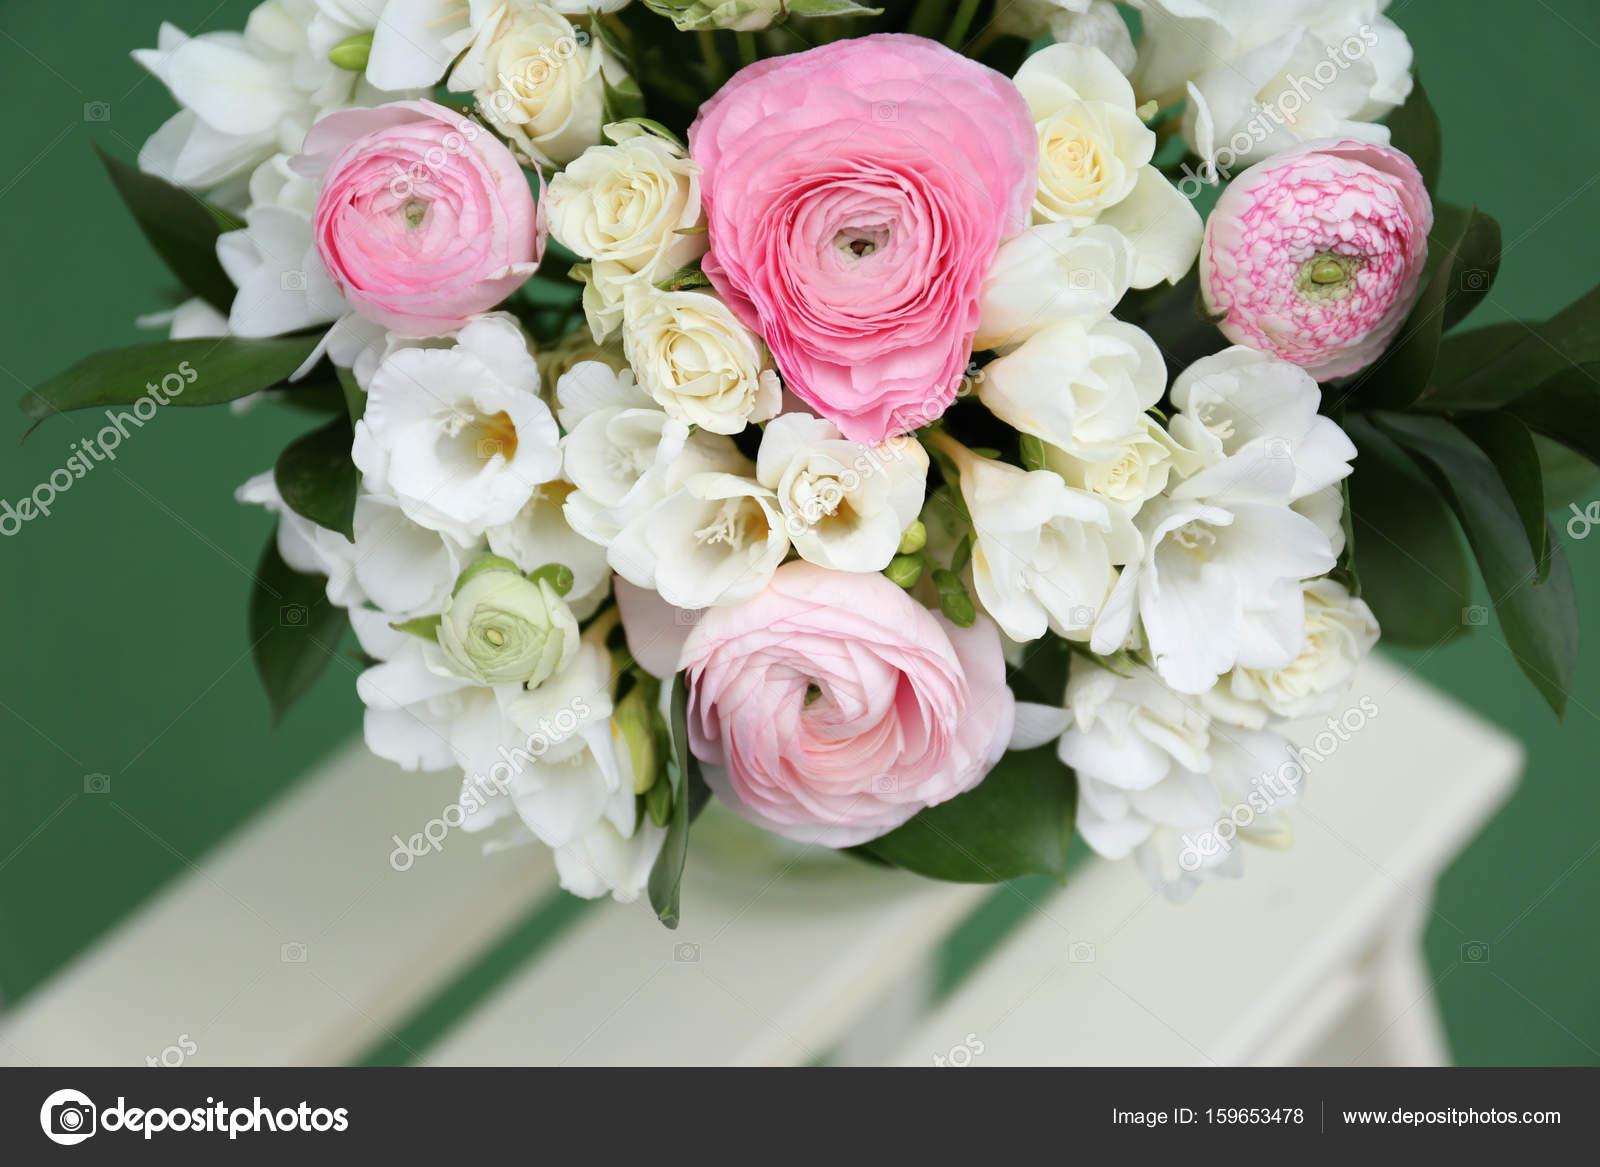 Bouquet with freesia flowers stock photo belchonock 159653478 beautiful bouquet with white freesia flowers closeup photo by belchonock izmirmasajfo Gallery